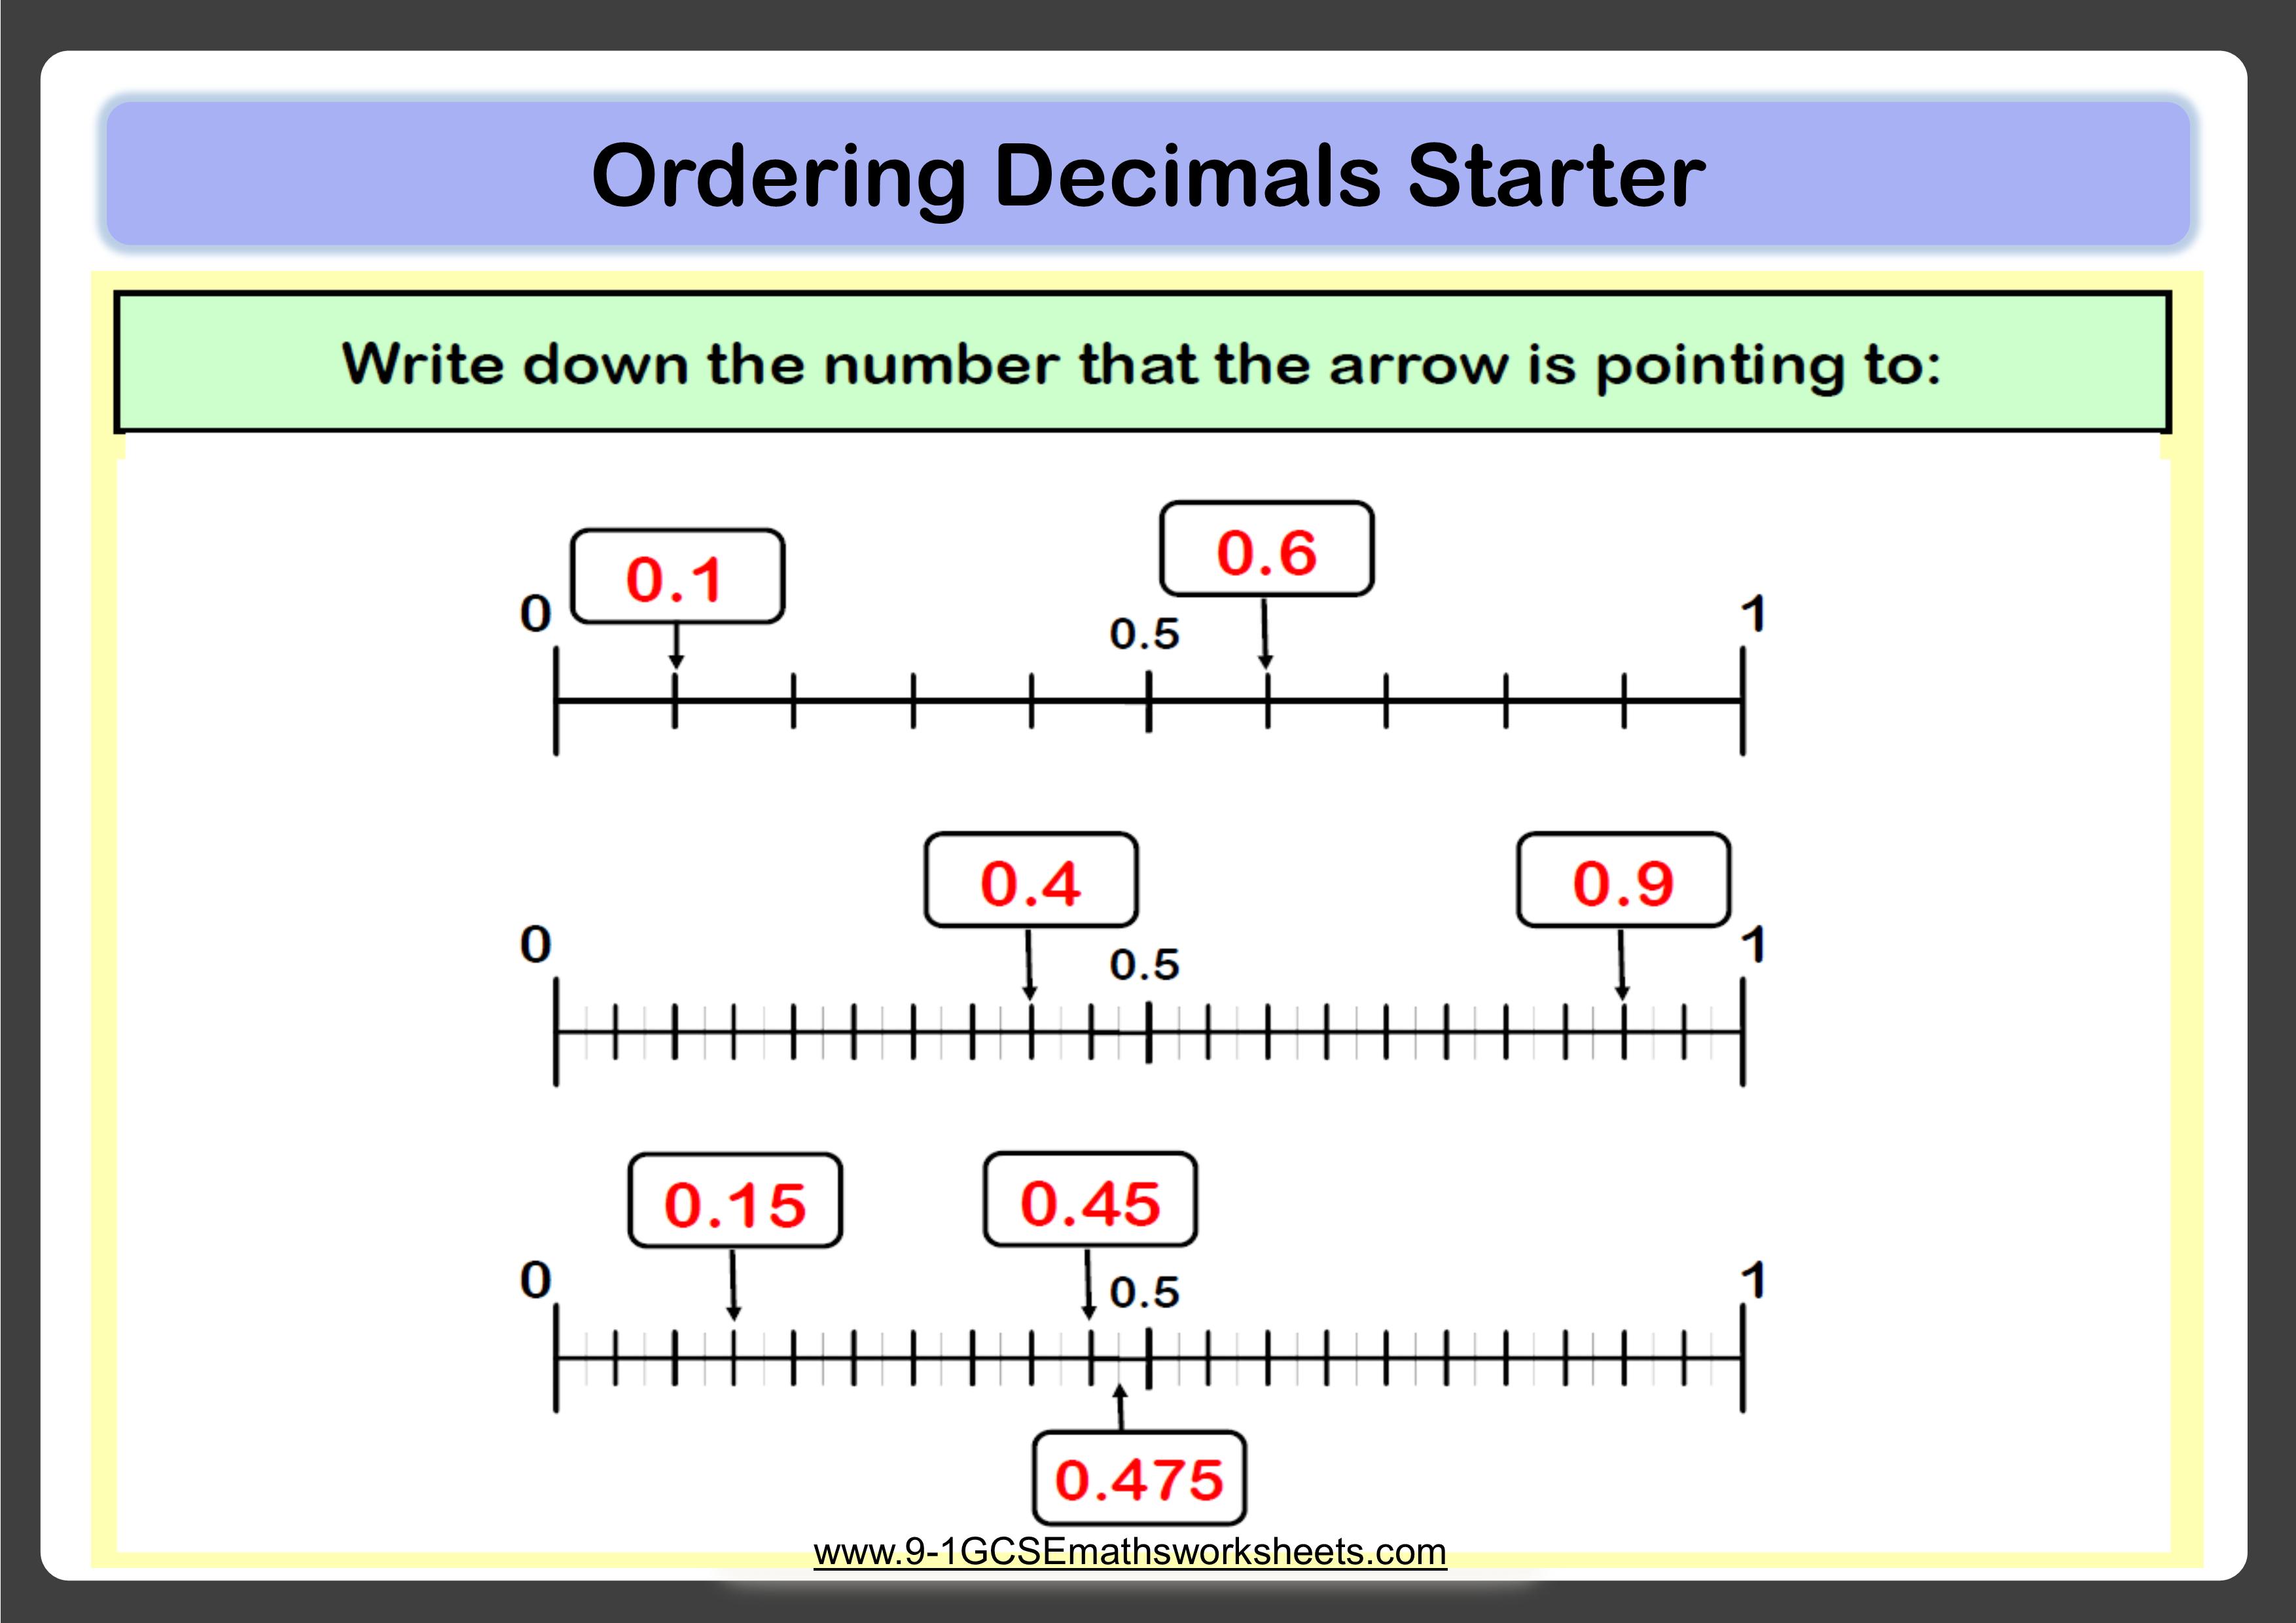 Ordering Decimals Starter